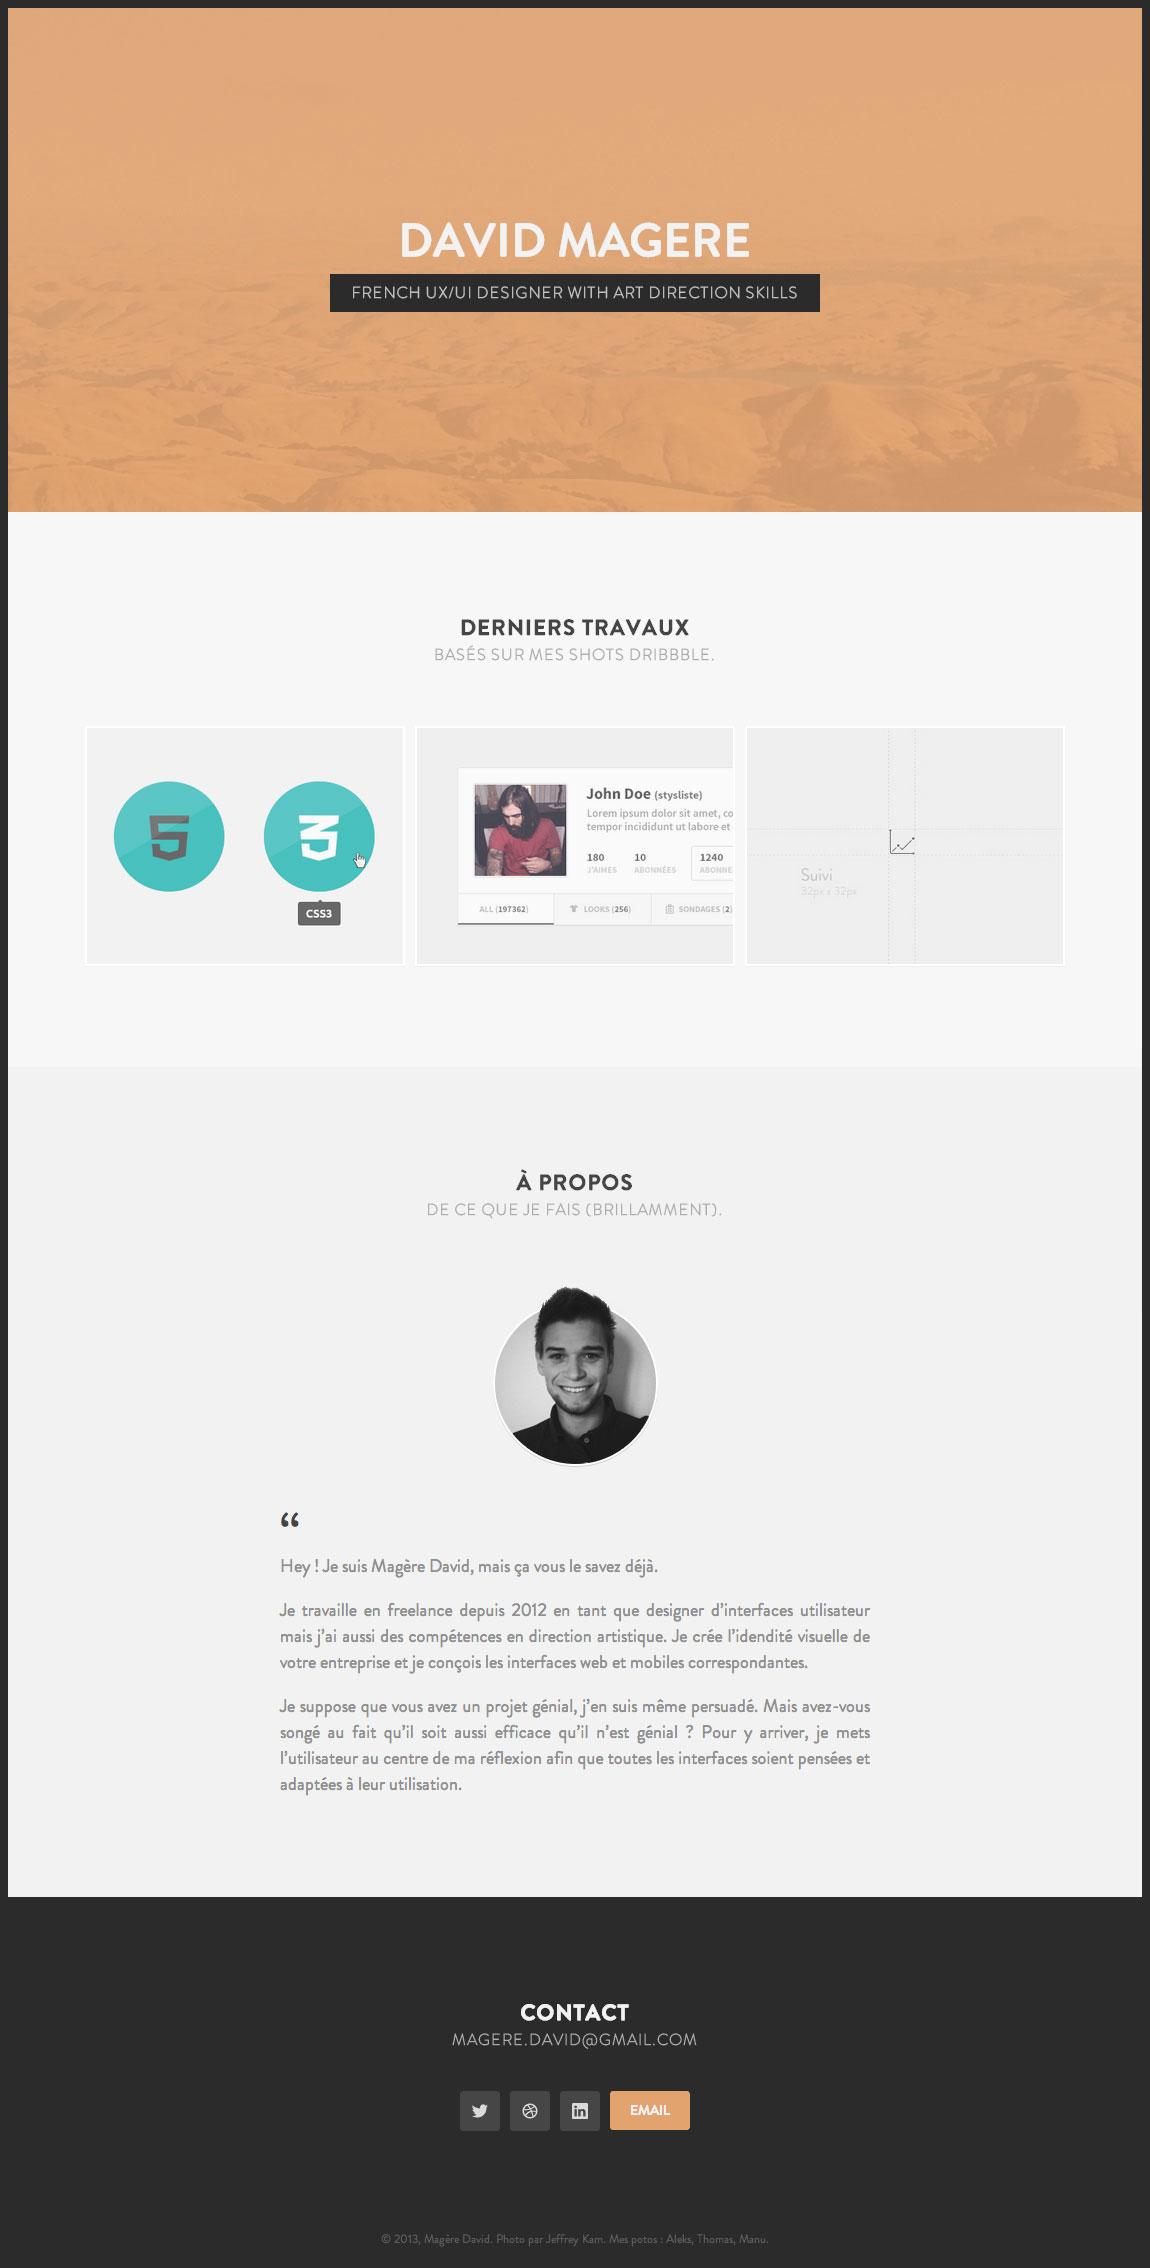 Magere David Website Screenshot